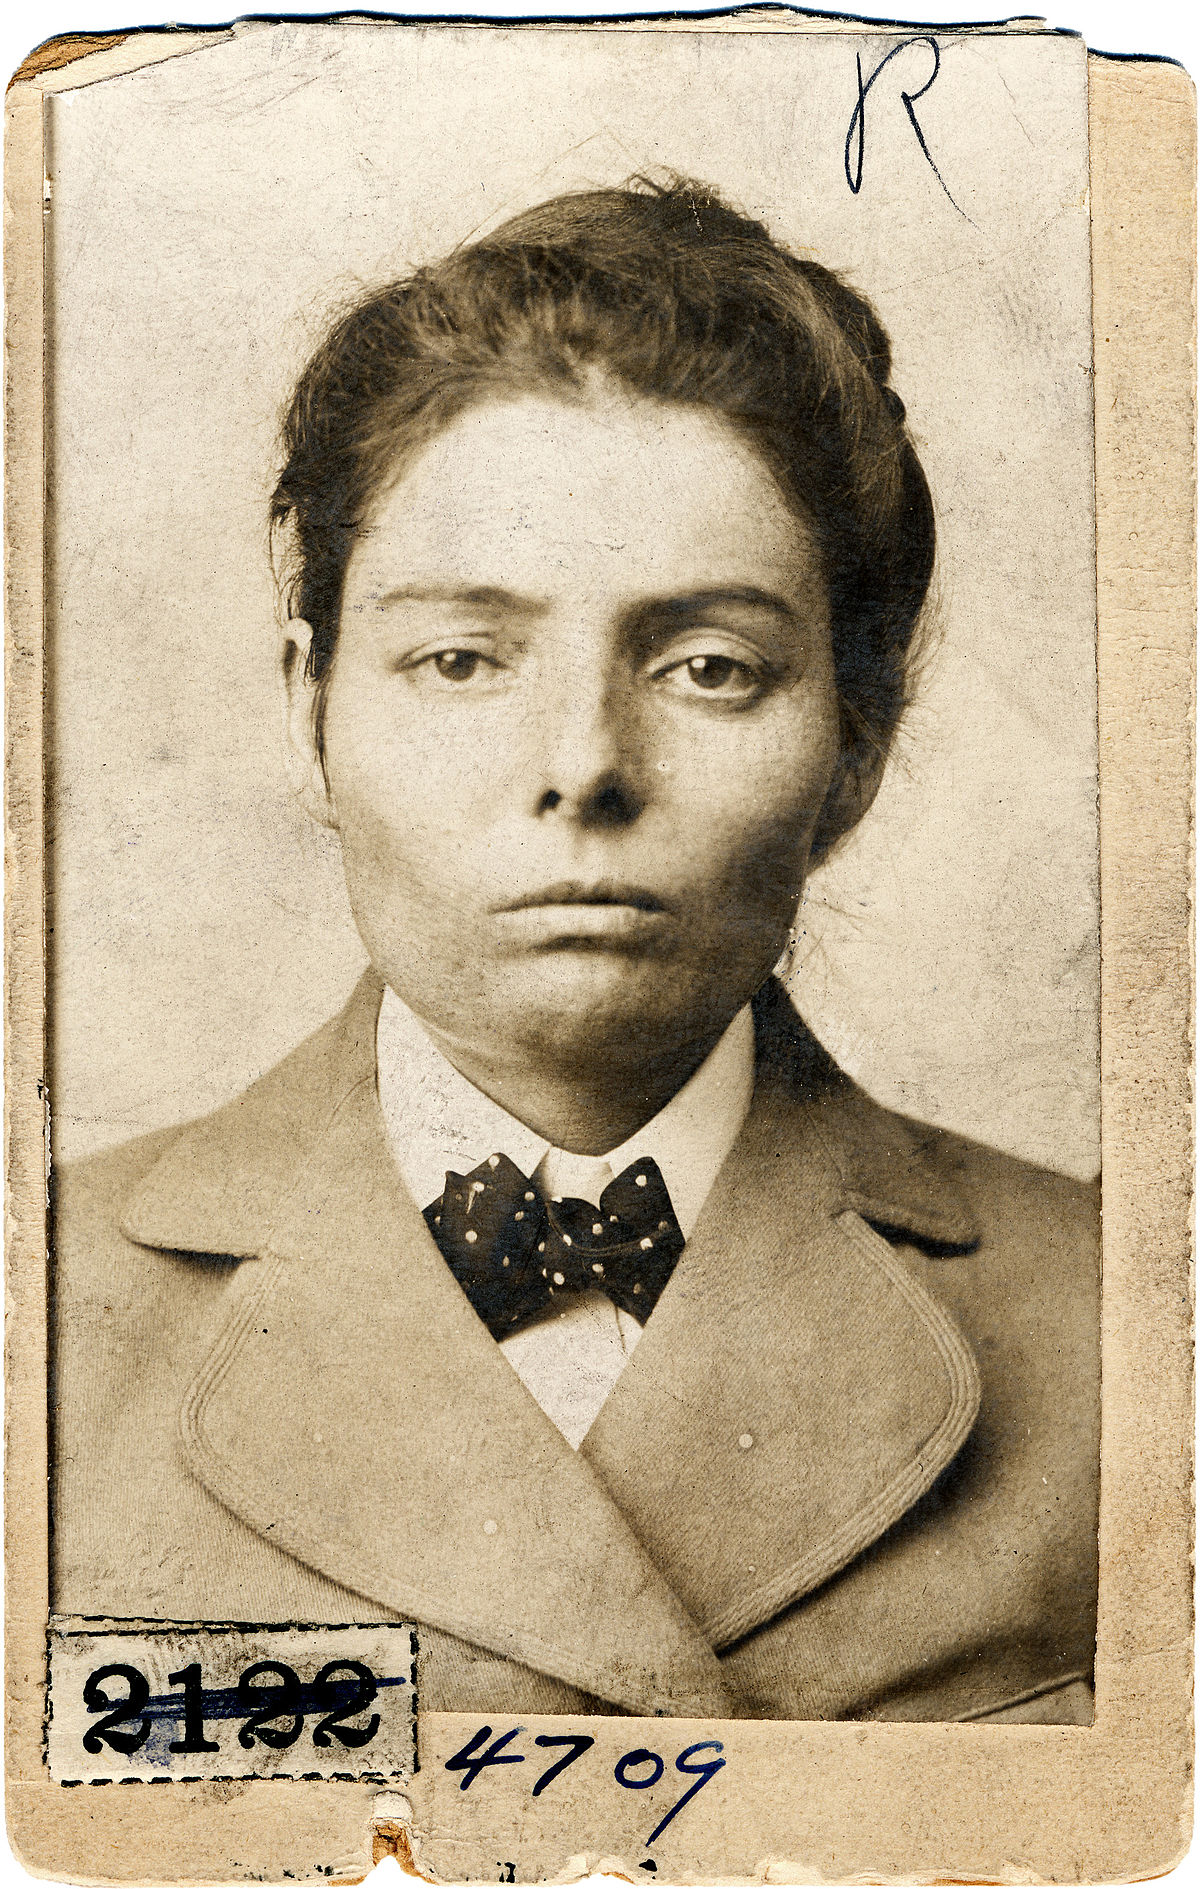 1200px-Laura_Bullion_of_the_Wild_Bunch_gang,_Pinkerton's_mug_shot,_1893.jpg